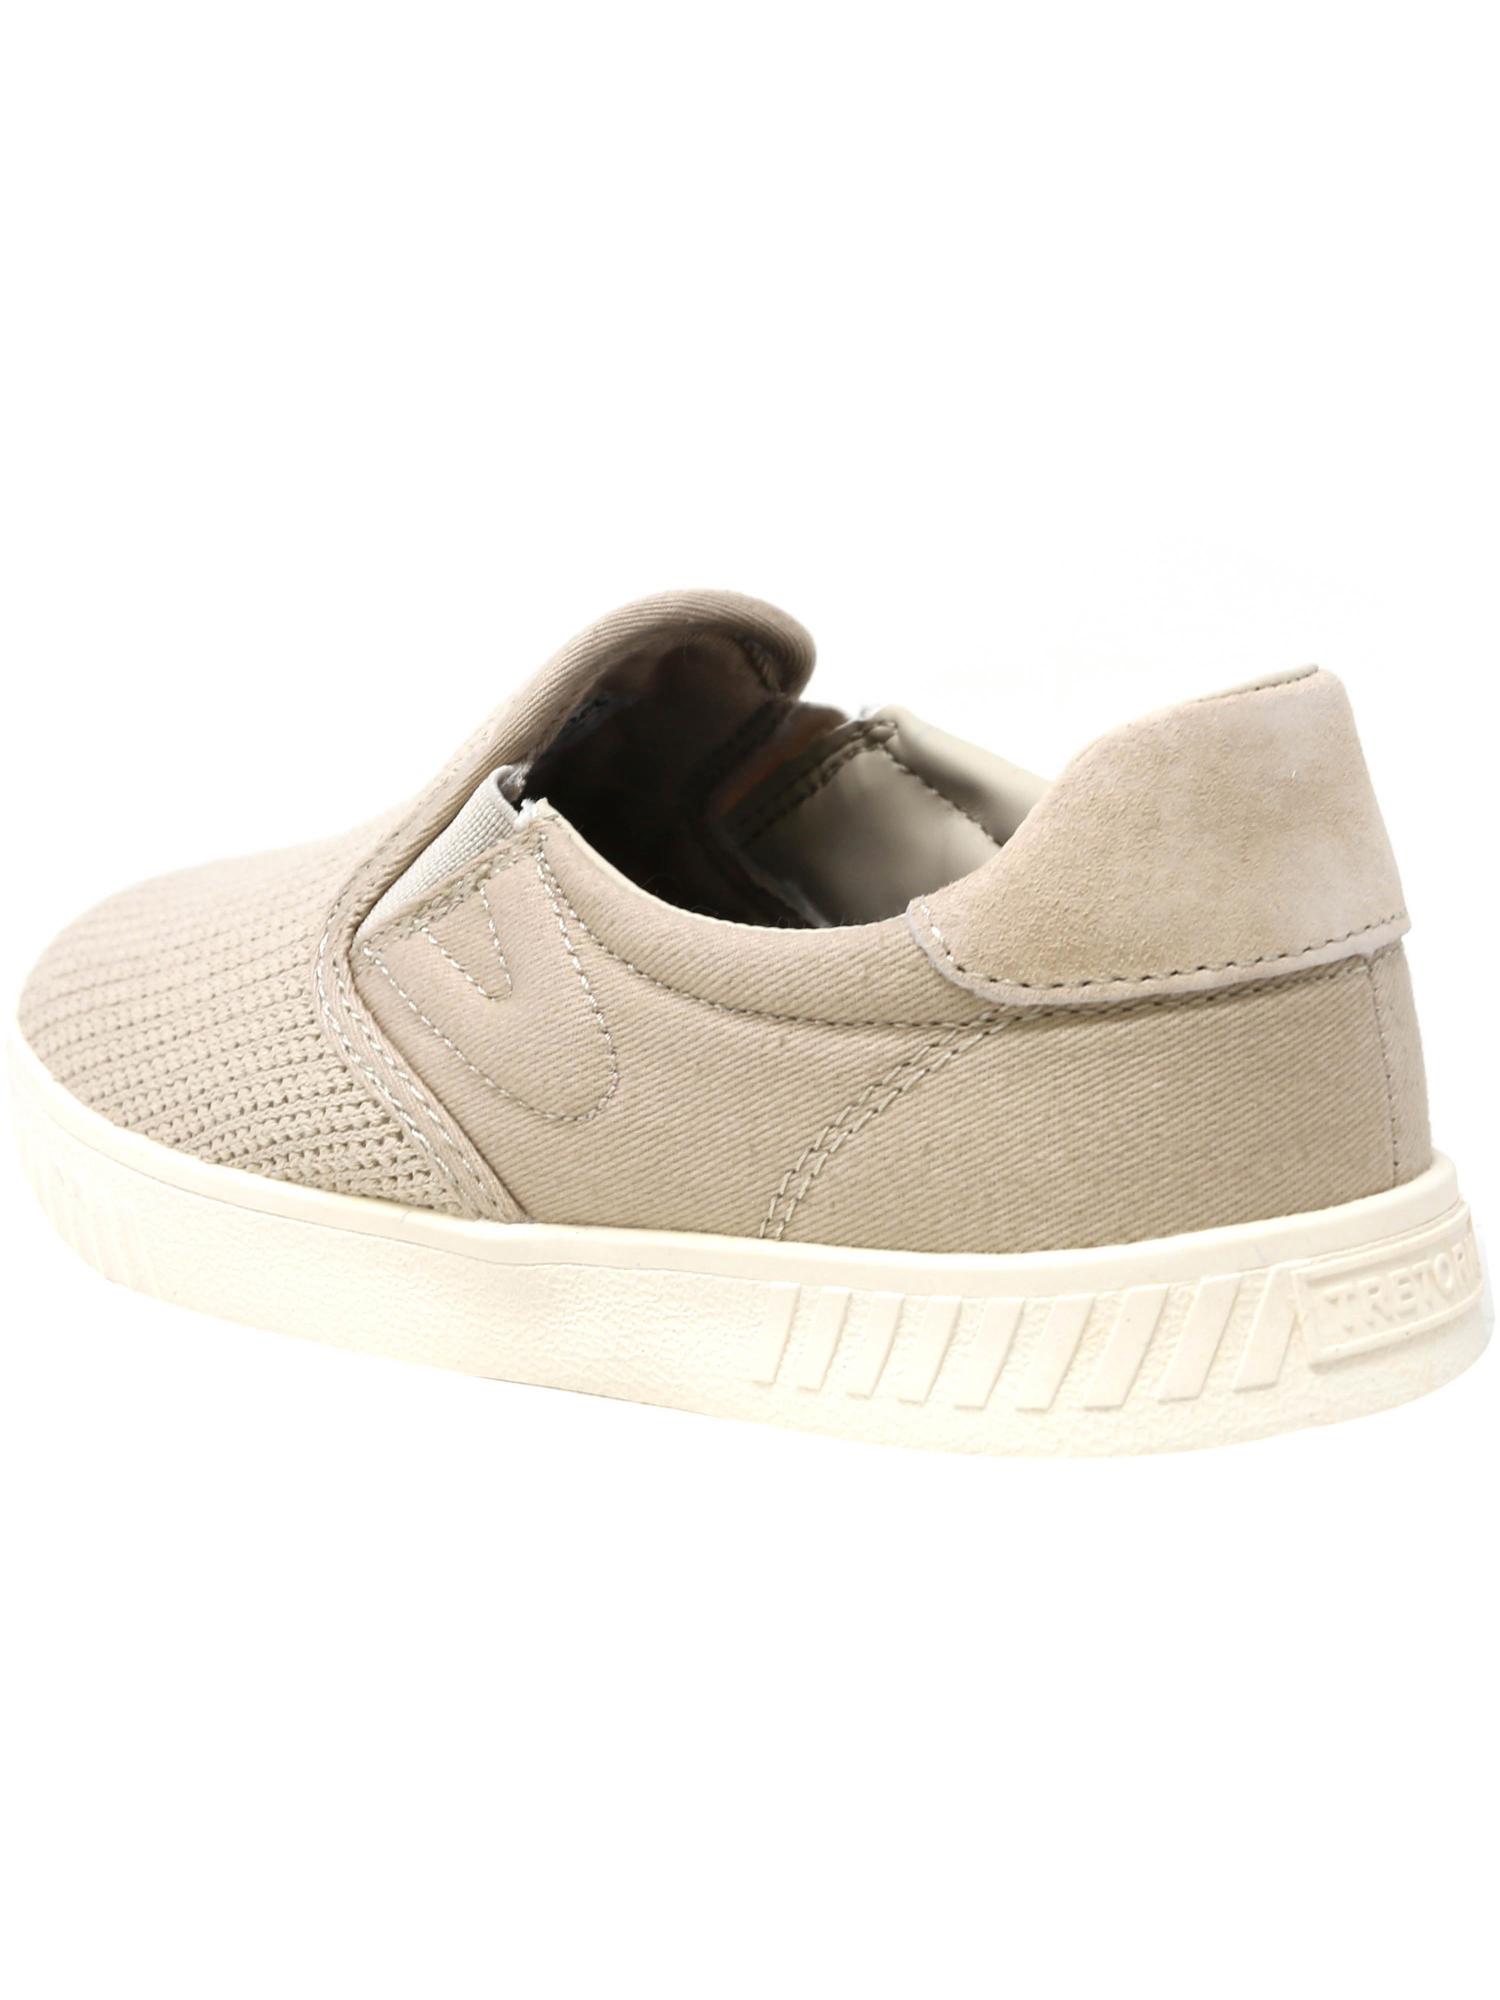 Tretorn-Femmes-Cruz-tissu-aux-chevilles-Haute-Slip-Chaussures-en miniature 11